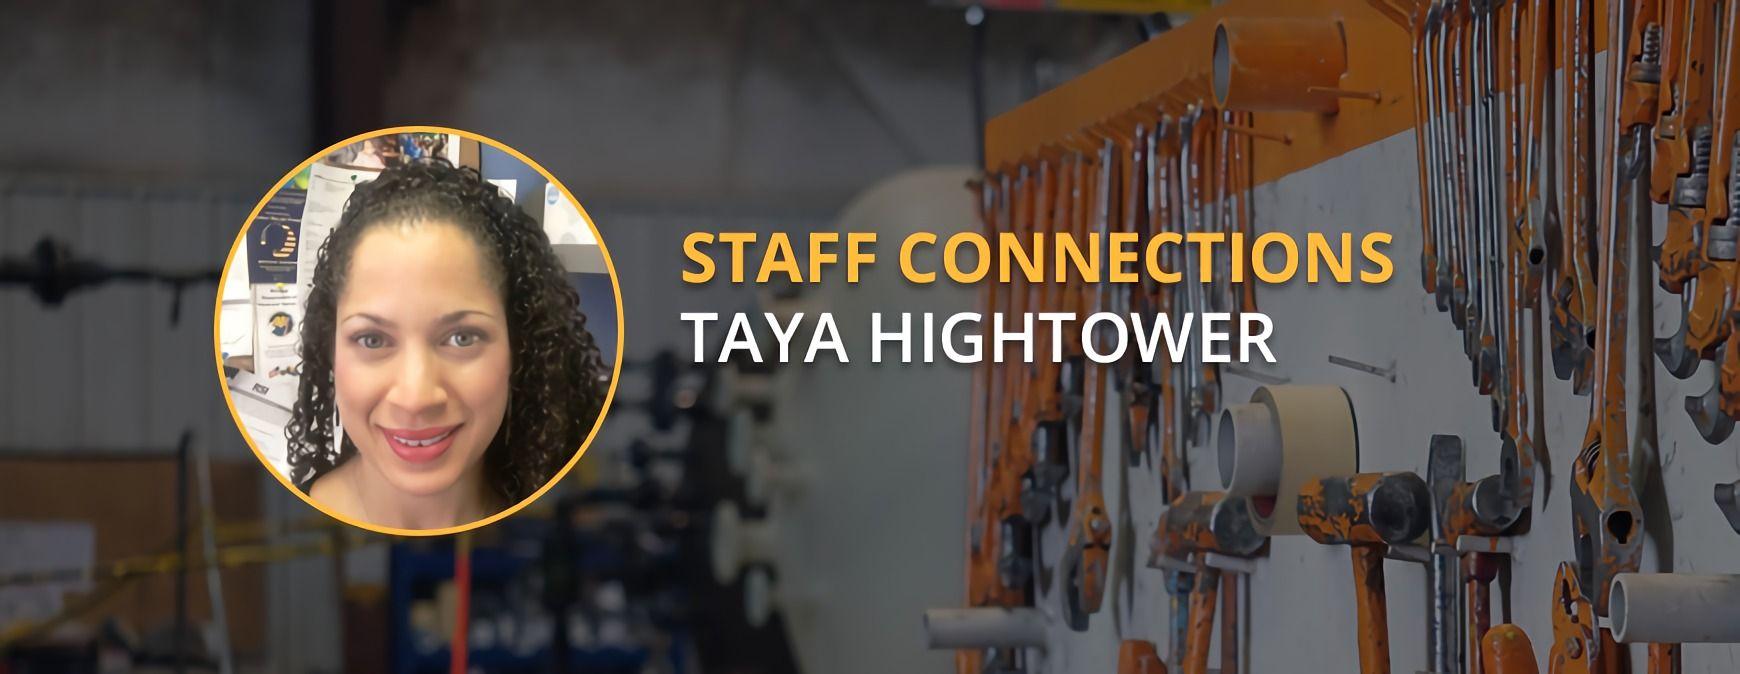 taya hightower staff connections